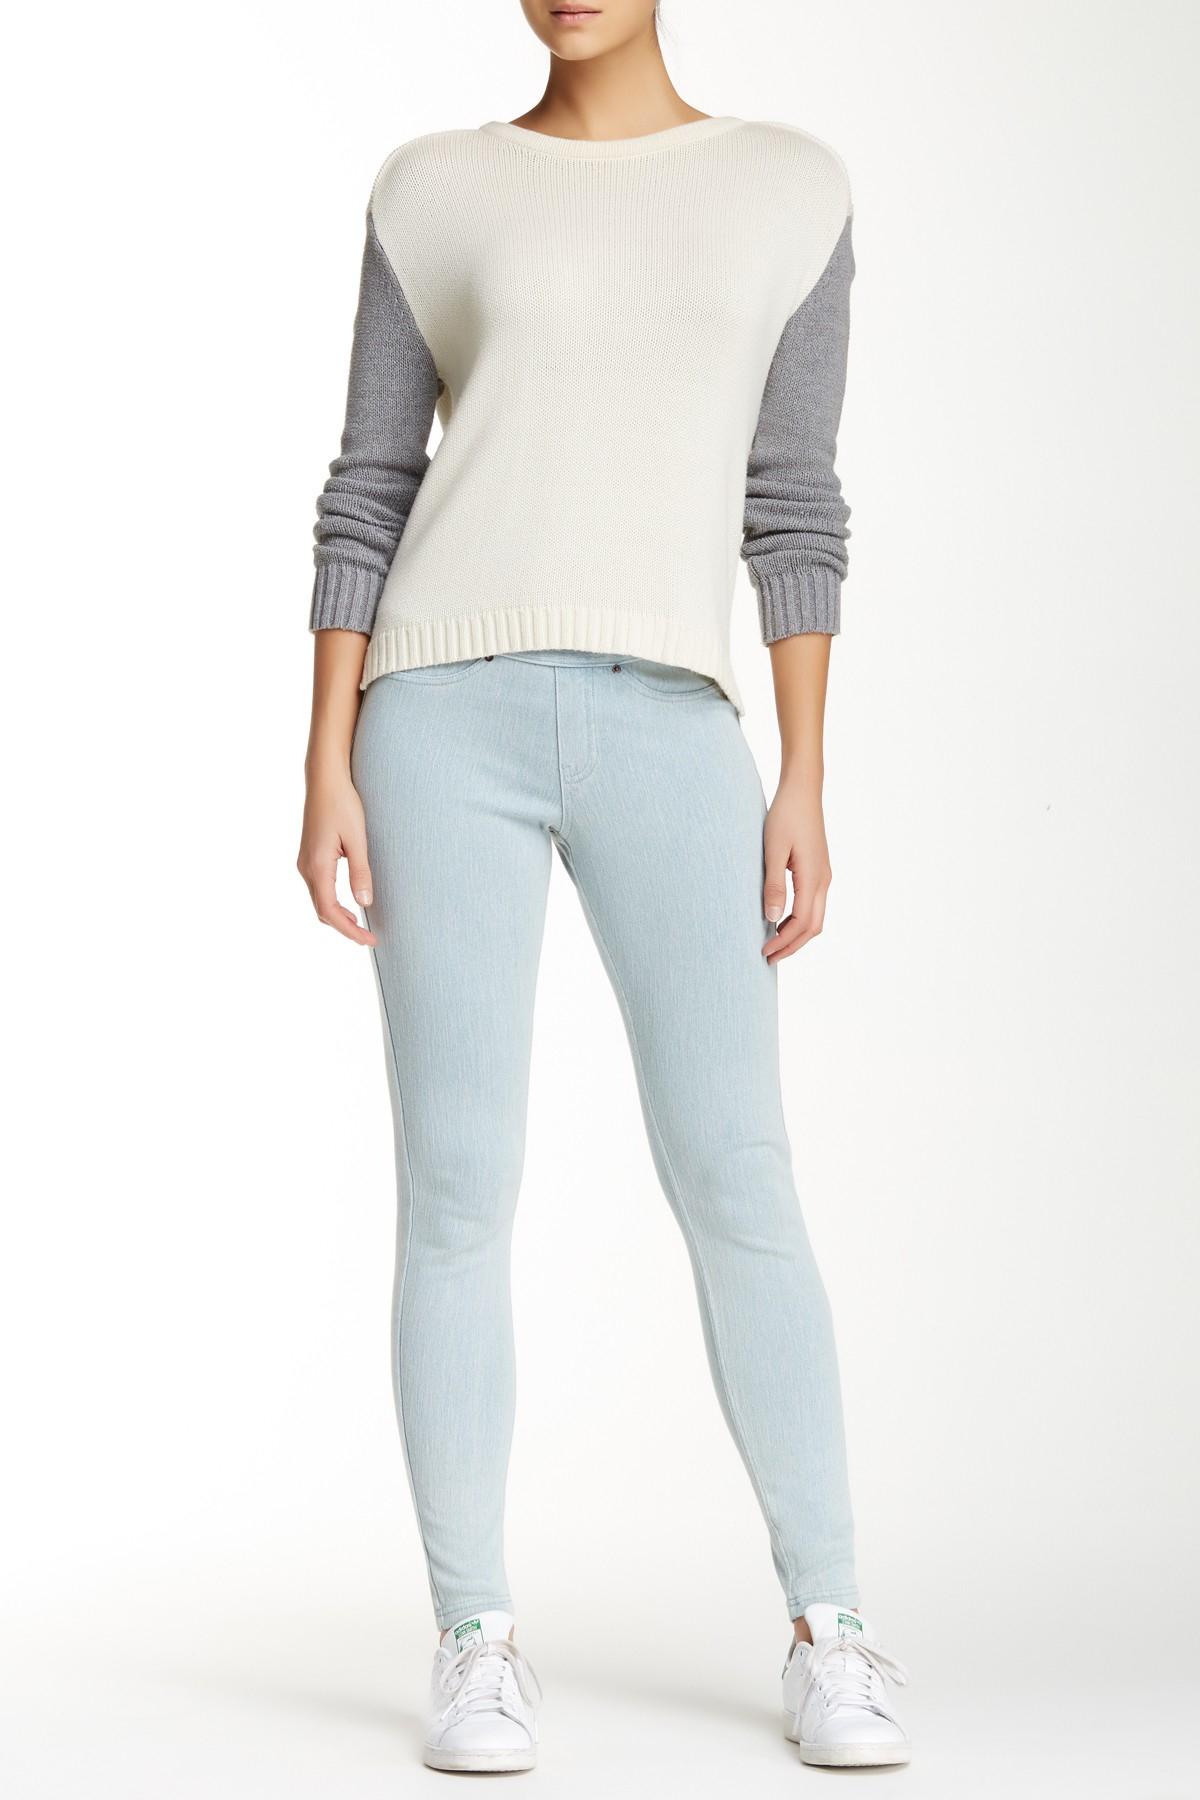 d732ec806d396 https   www.lyst.com clothing maje-raz-cotton-blend-dress-ecru  2018 ...